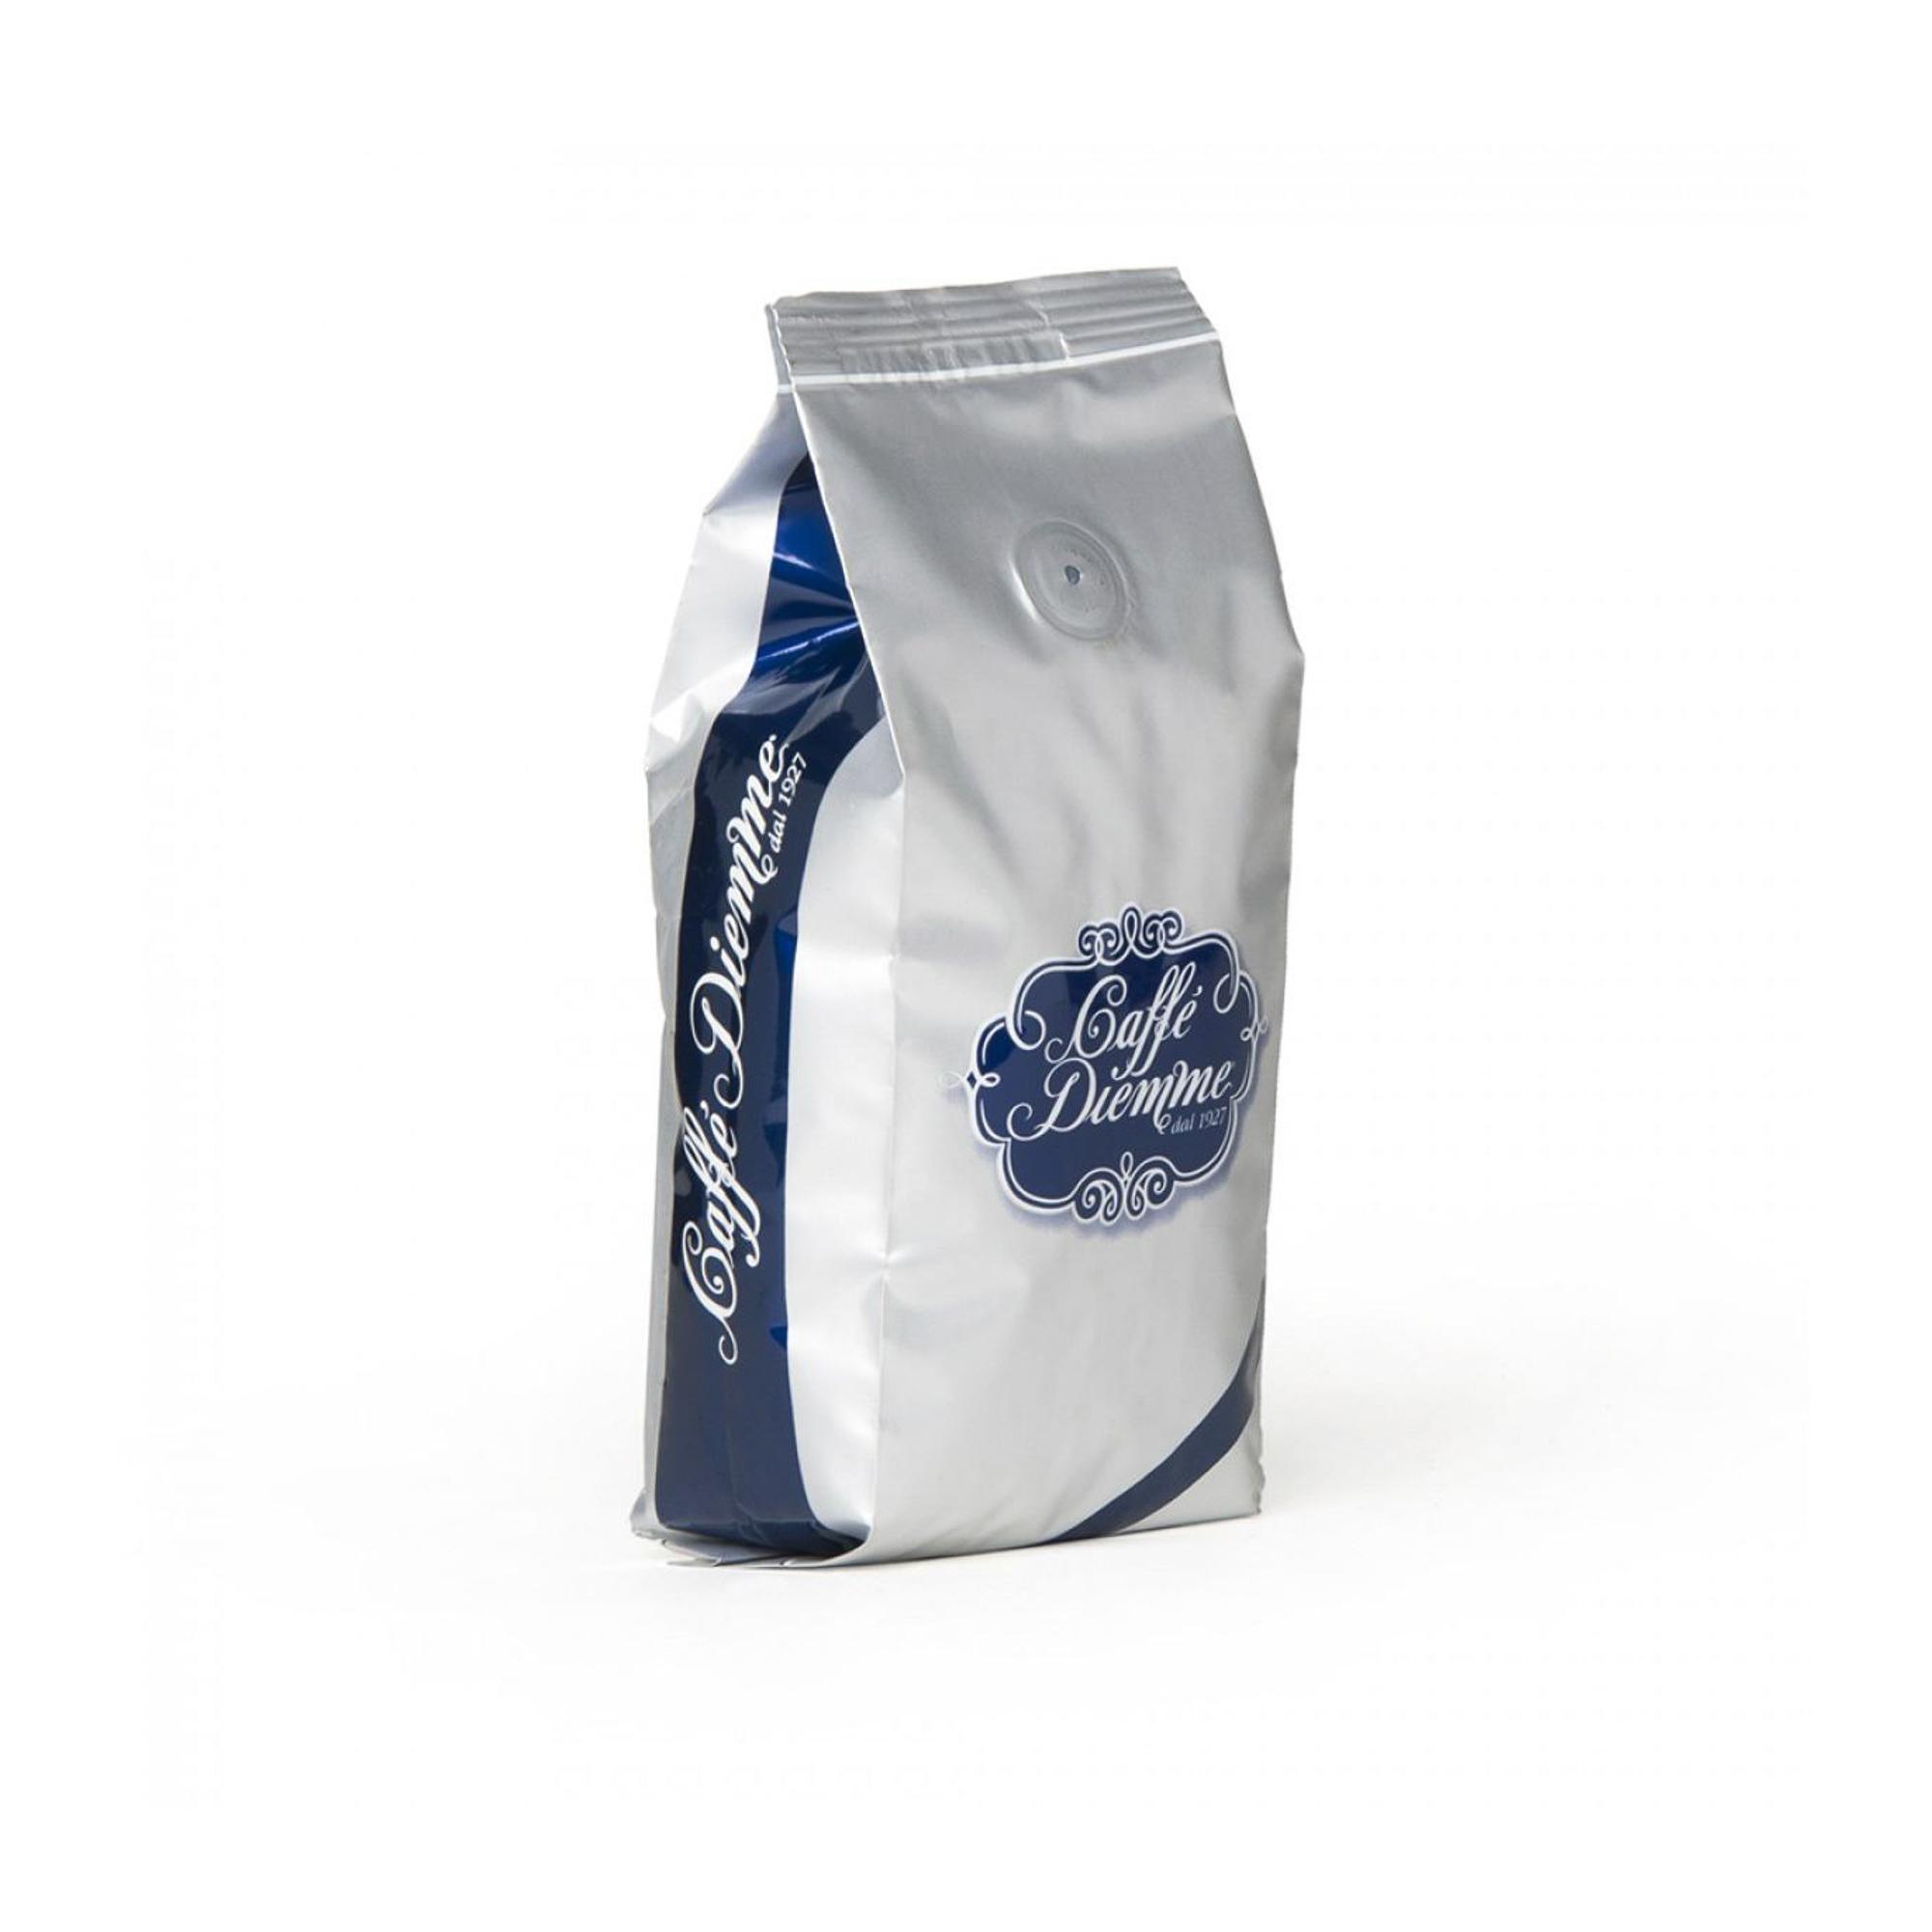 Кофе в зернах Diemme Caffe Miscela Excellent 500 г кофе в зернах caffe diemme miscela oro арабика 500 г